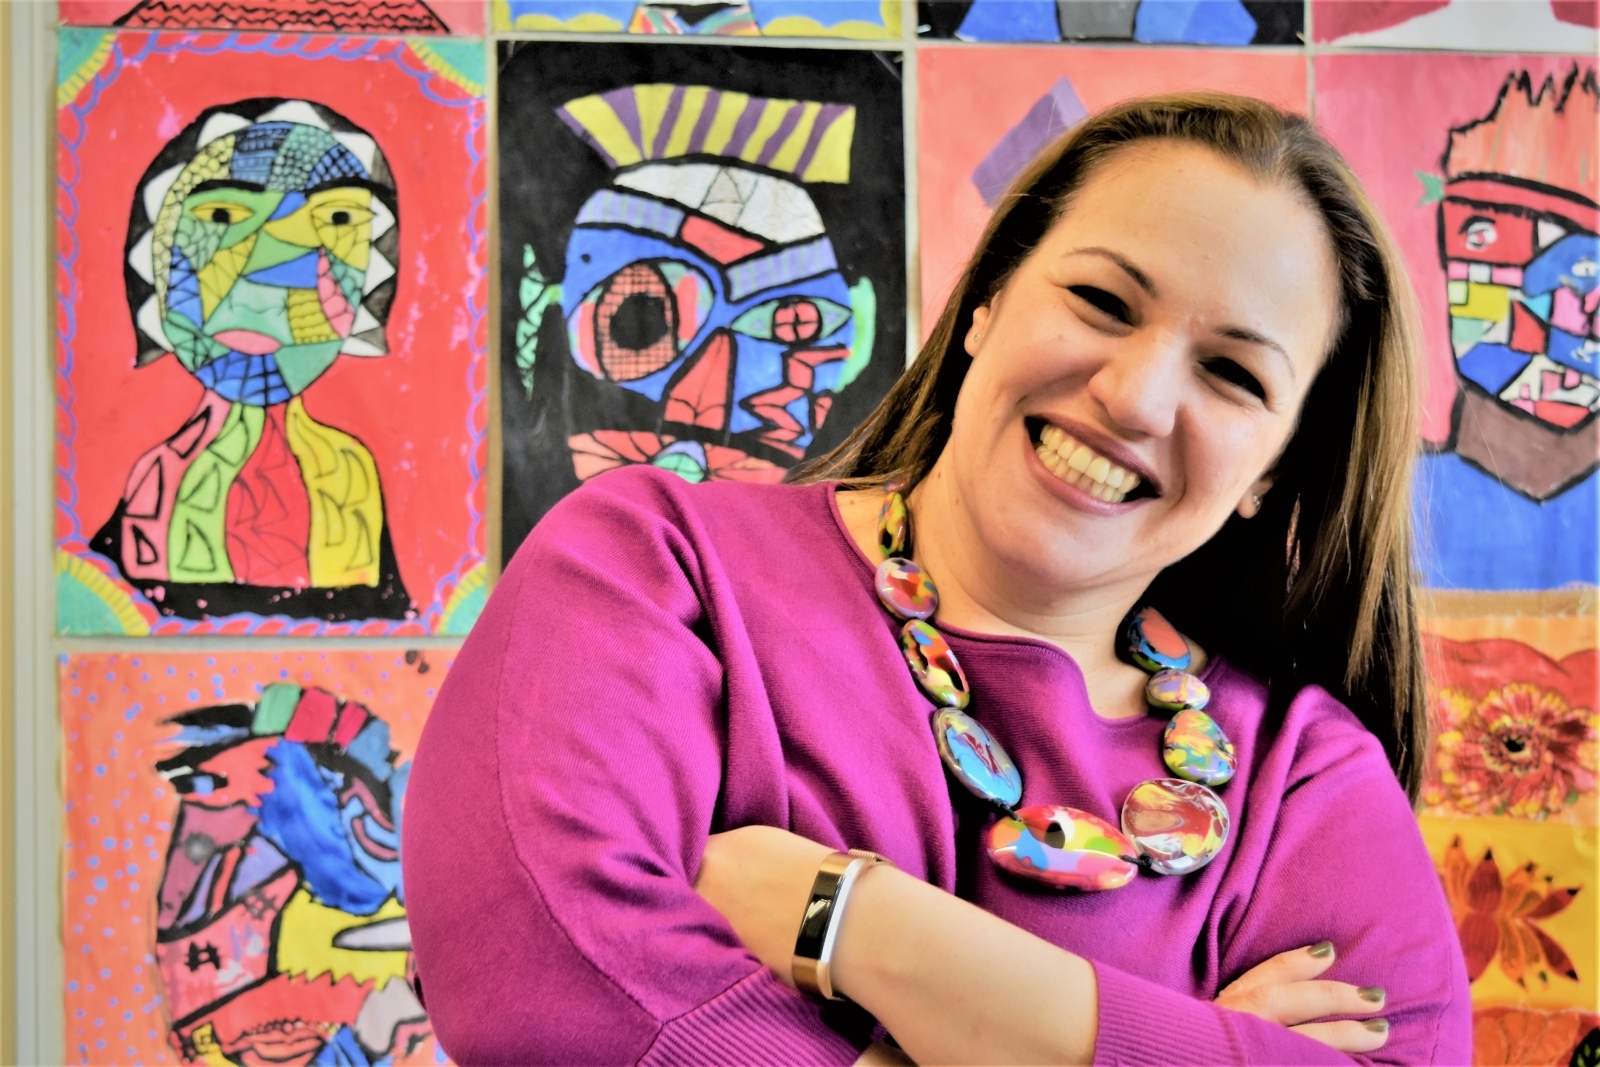 United Kingdom teacher named in top 10 for $1m global prize